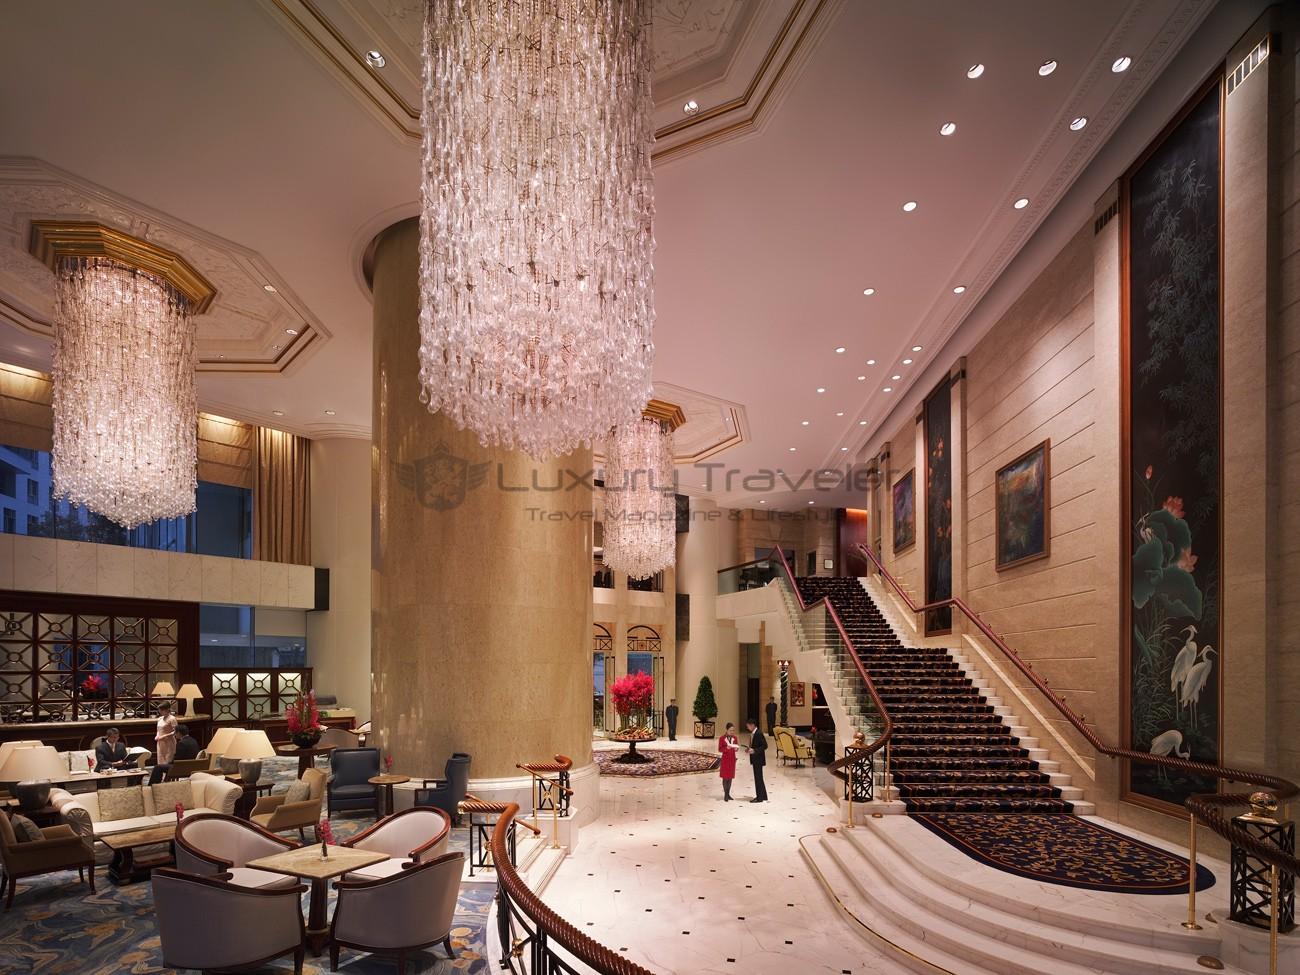 Island_Shangri-La_Hotel_Hong_Kong_Hotel_Lobby